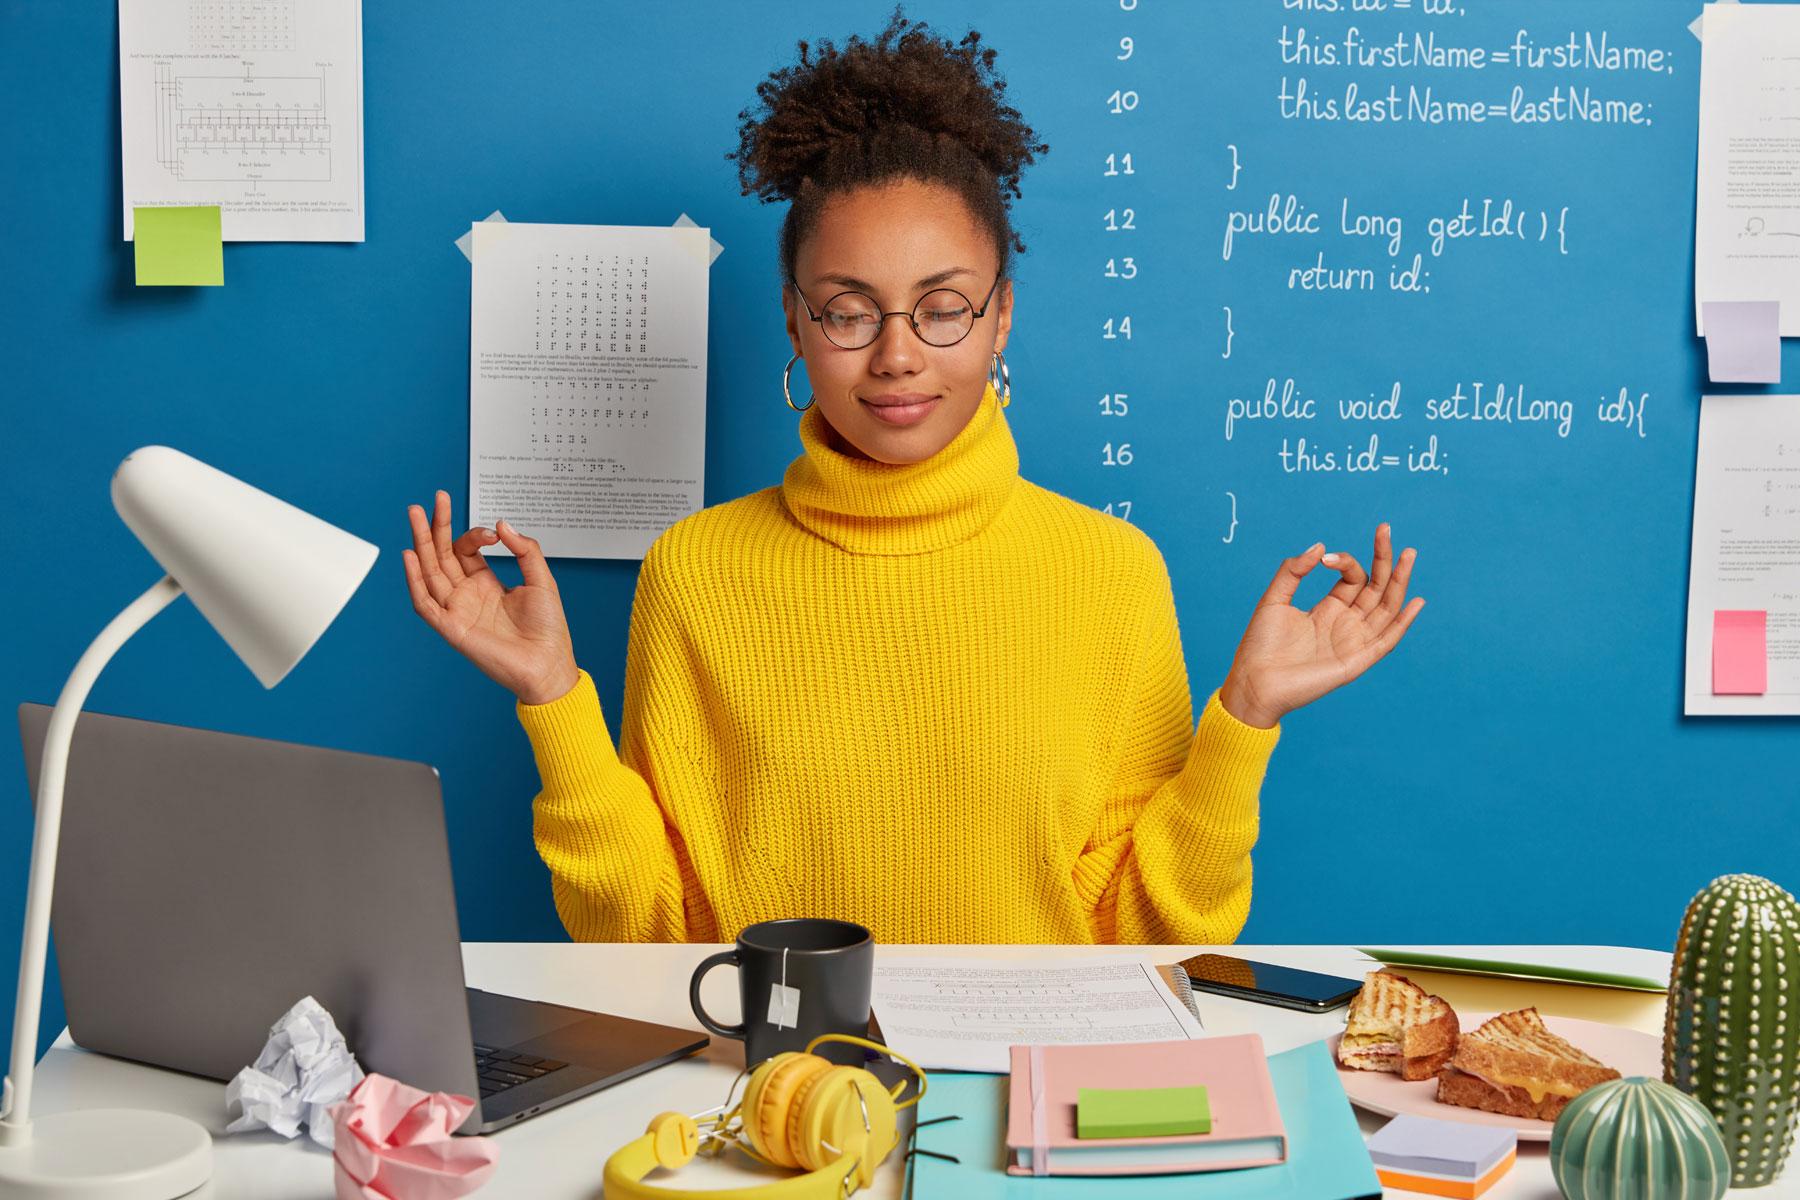 How to increase work flexibility